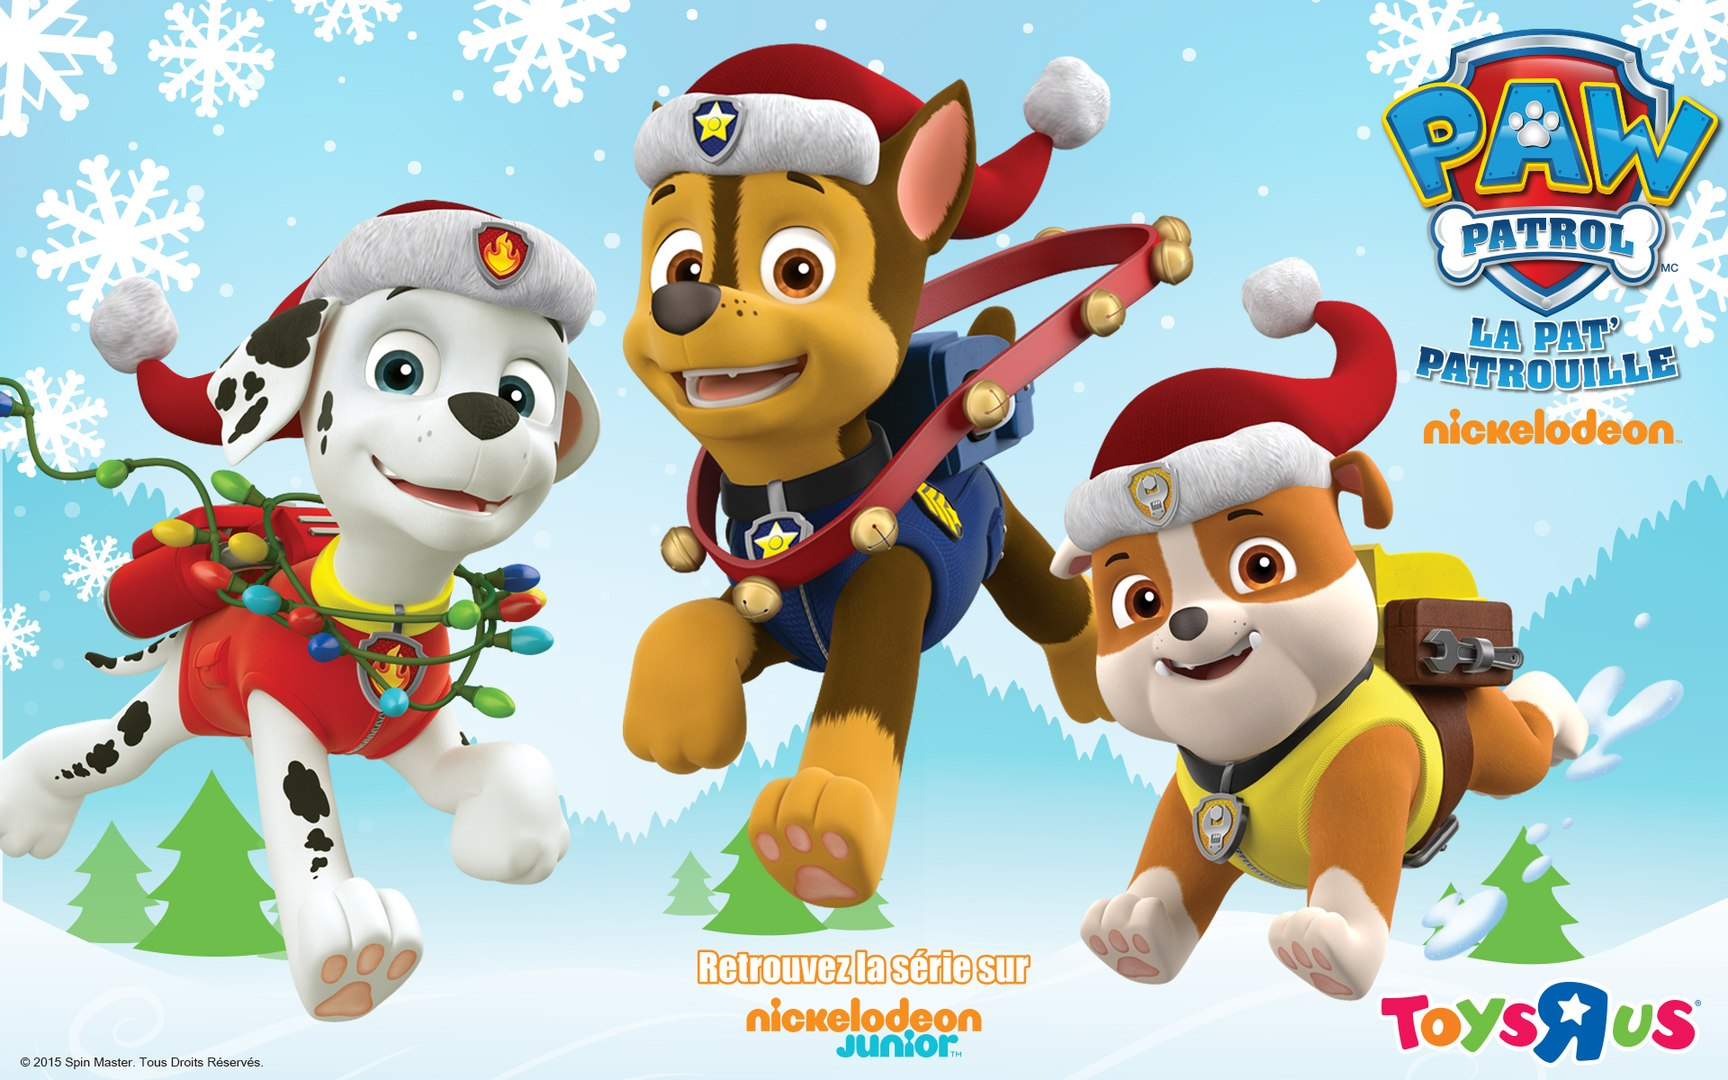 La Pat Patrouille Joyeux Noël Les Amis Merry Christmas And Happy New Year 2017